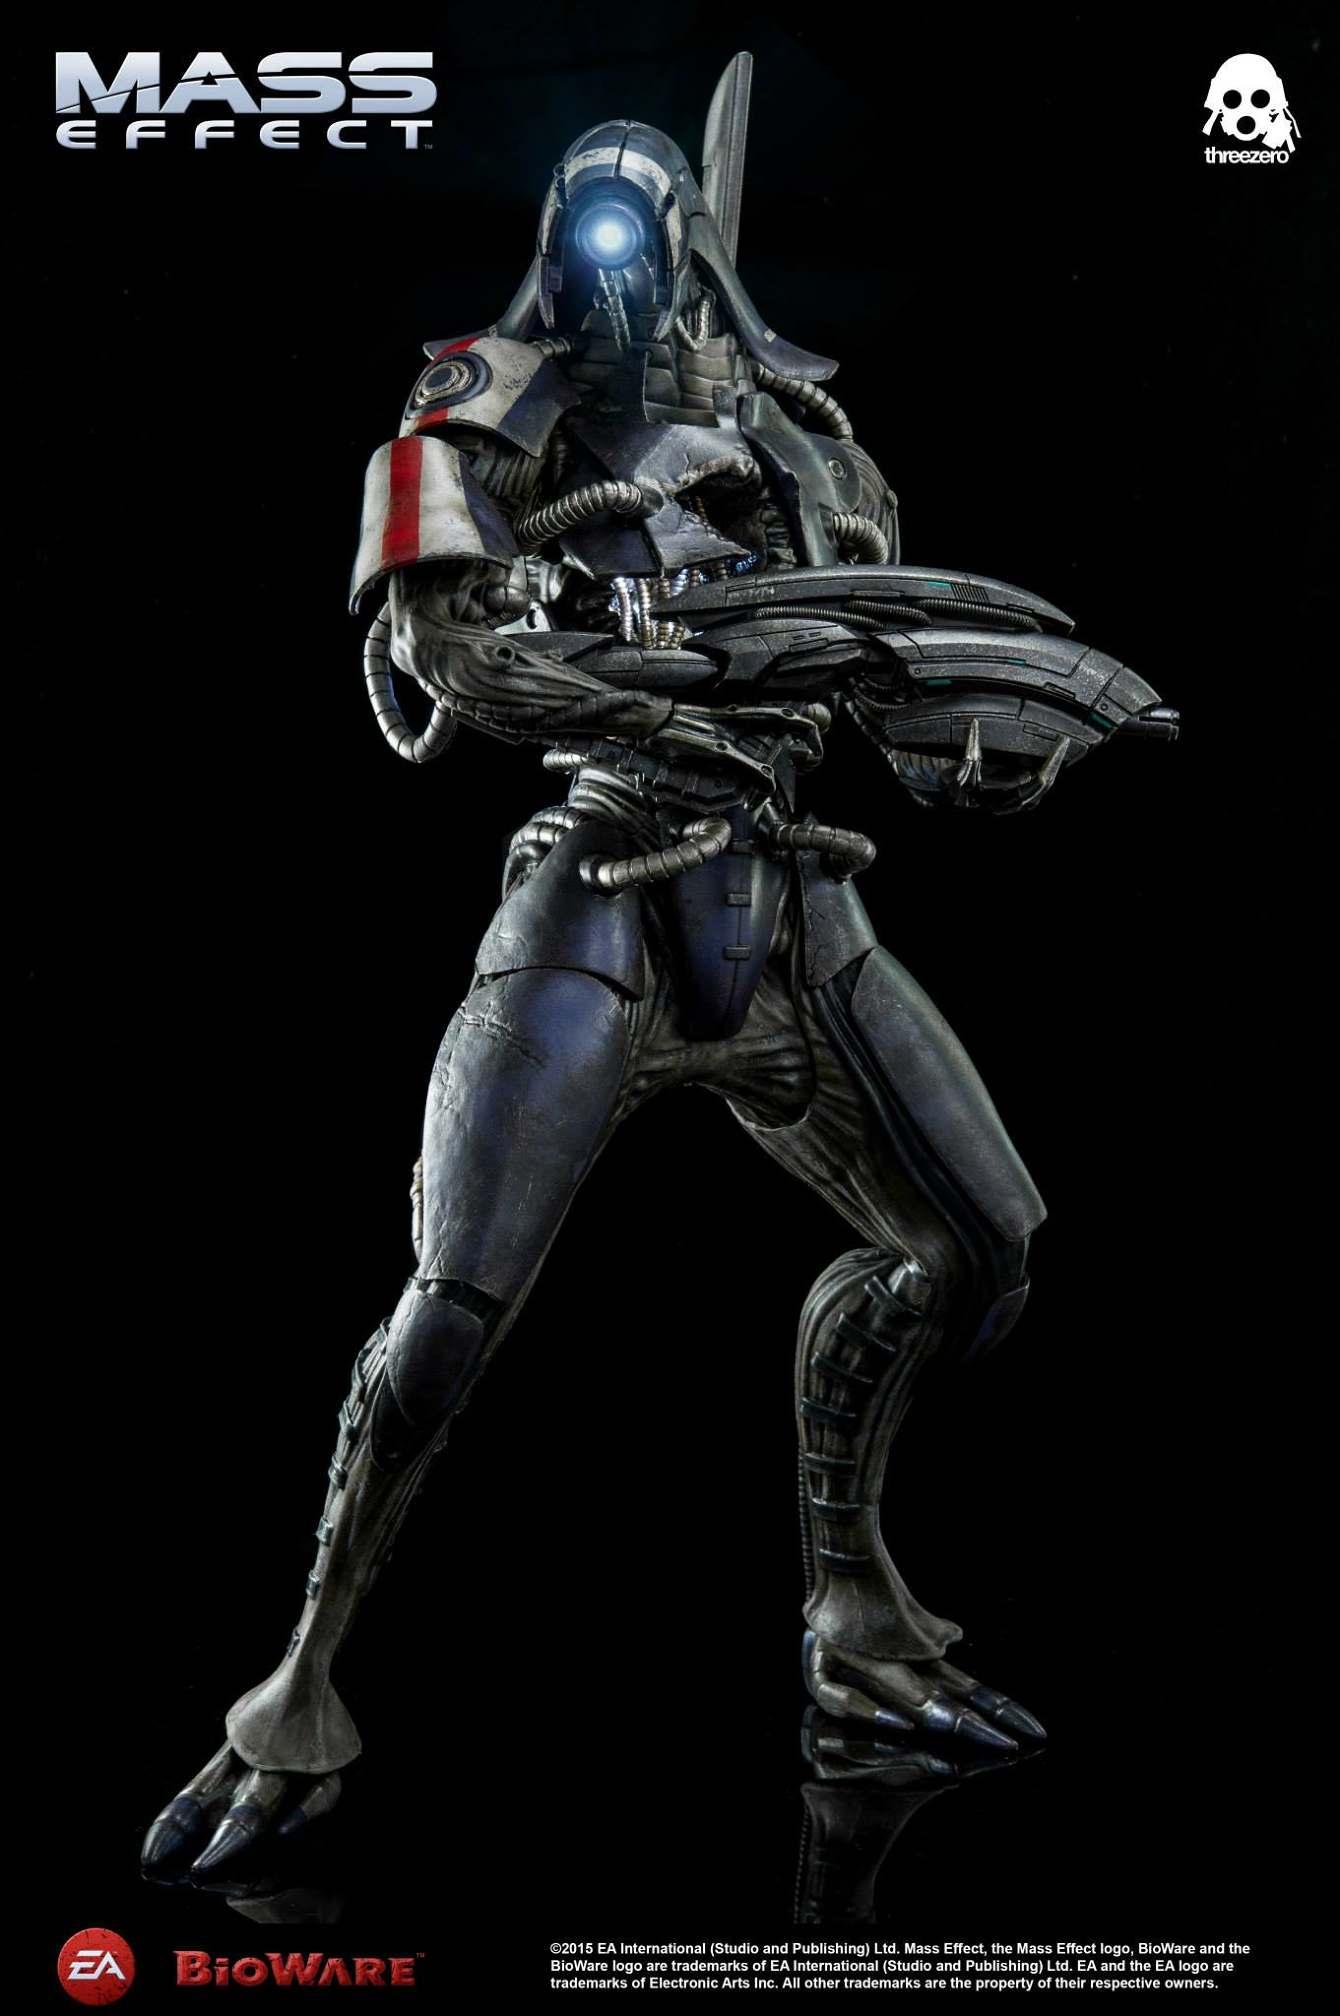 ThreeZero-Bioware-video-game-Legion-Mass-Effect-figure-16_1340_c.jpg